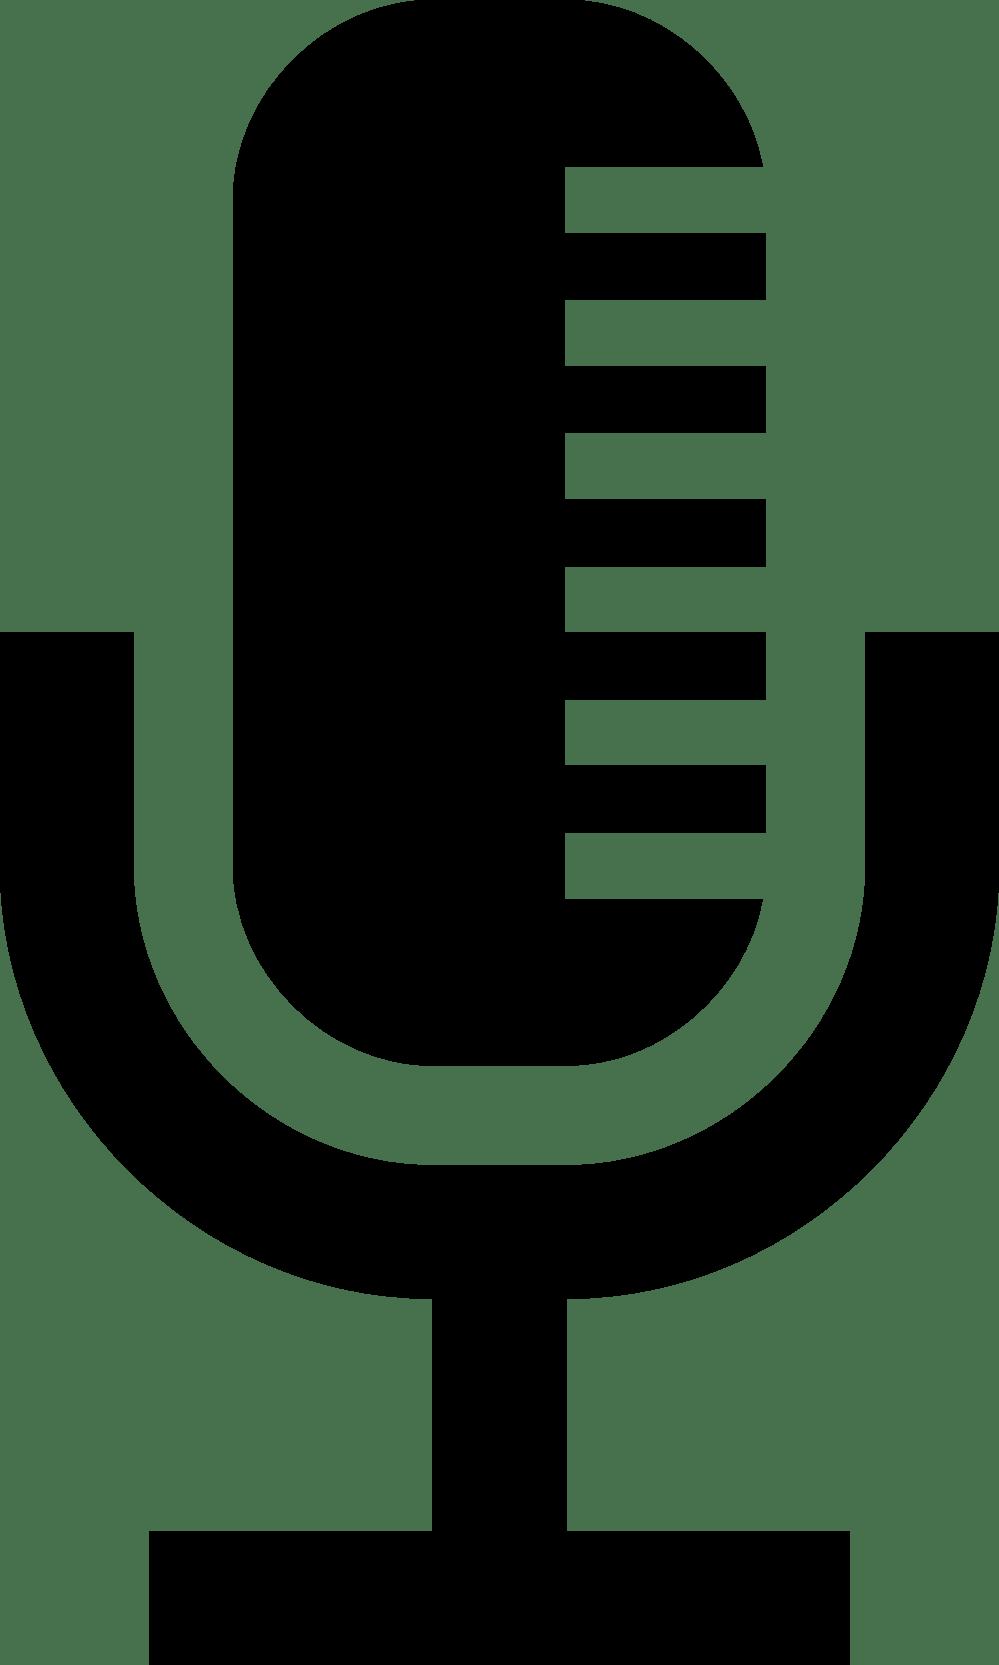 Logo Microphone ClipArt Best